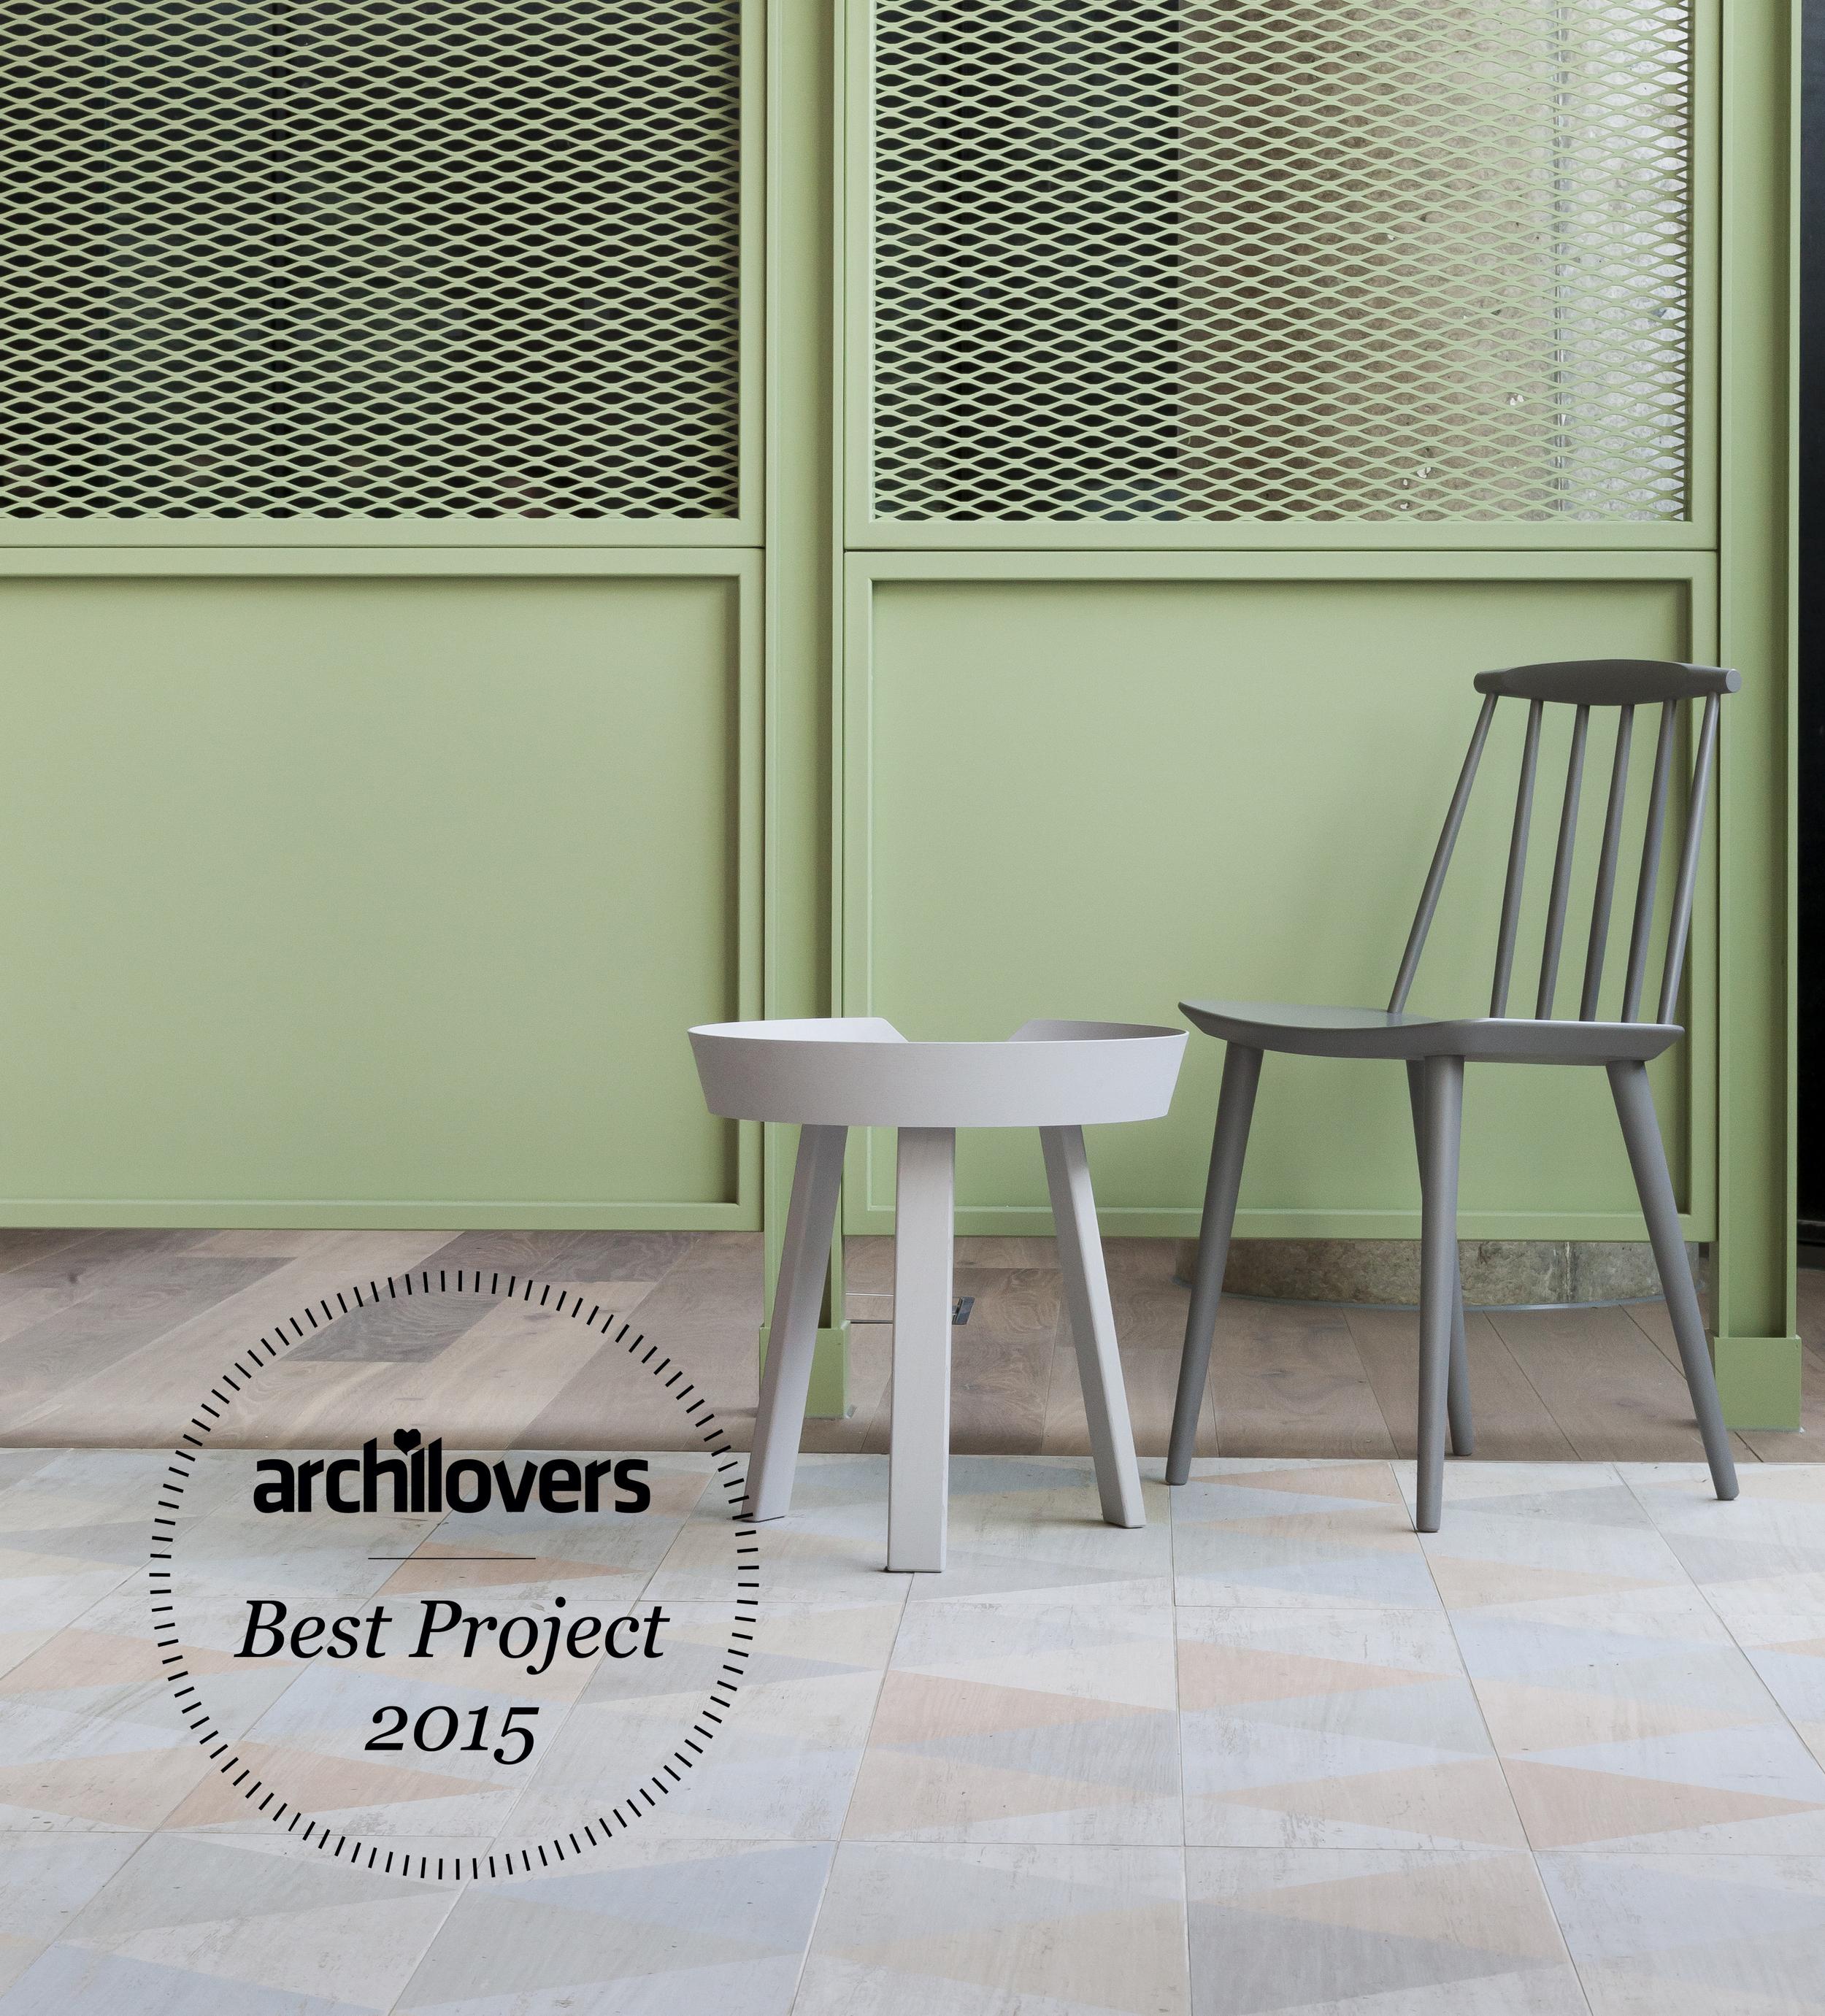 Archilovers Best.jpg